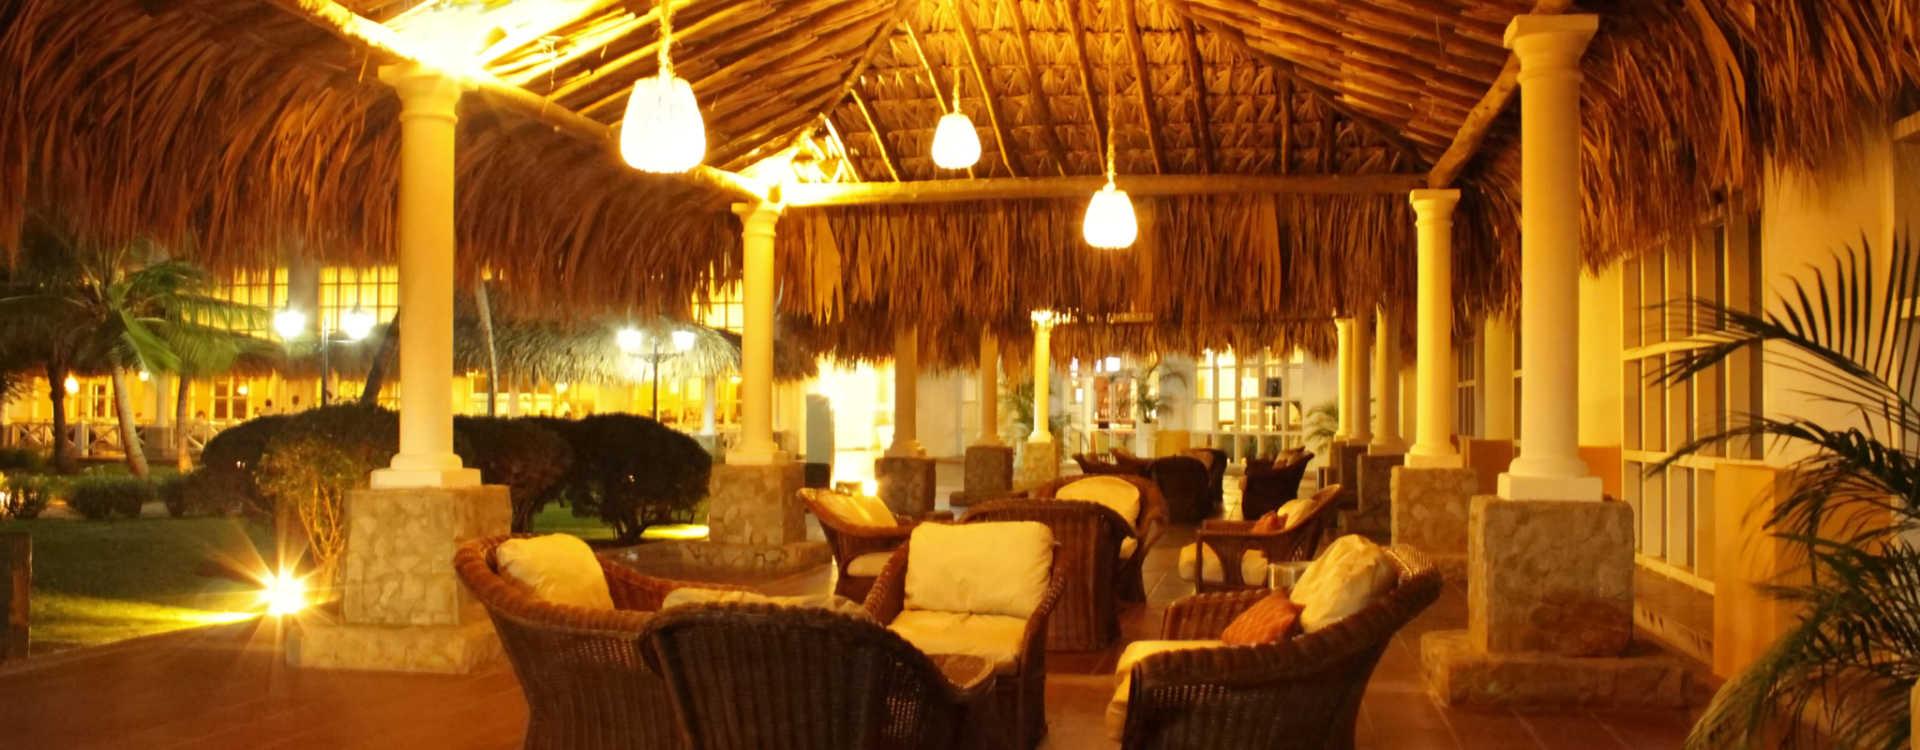 Exteriores Hotel Hesperia Isla Margarita